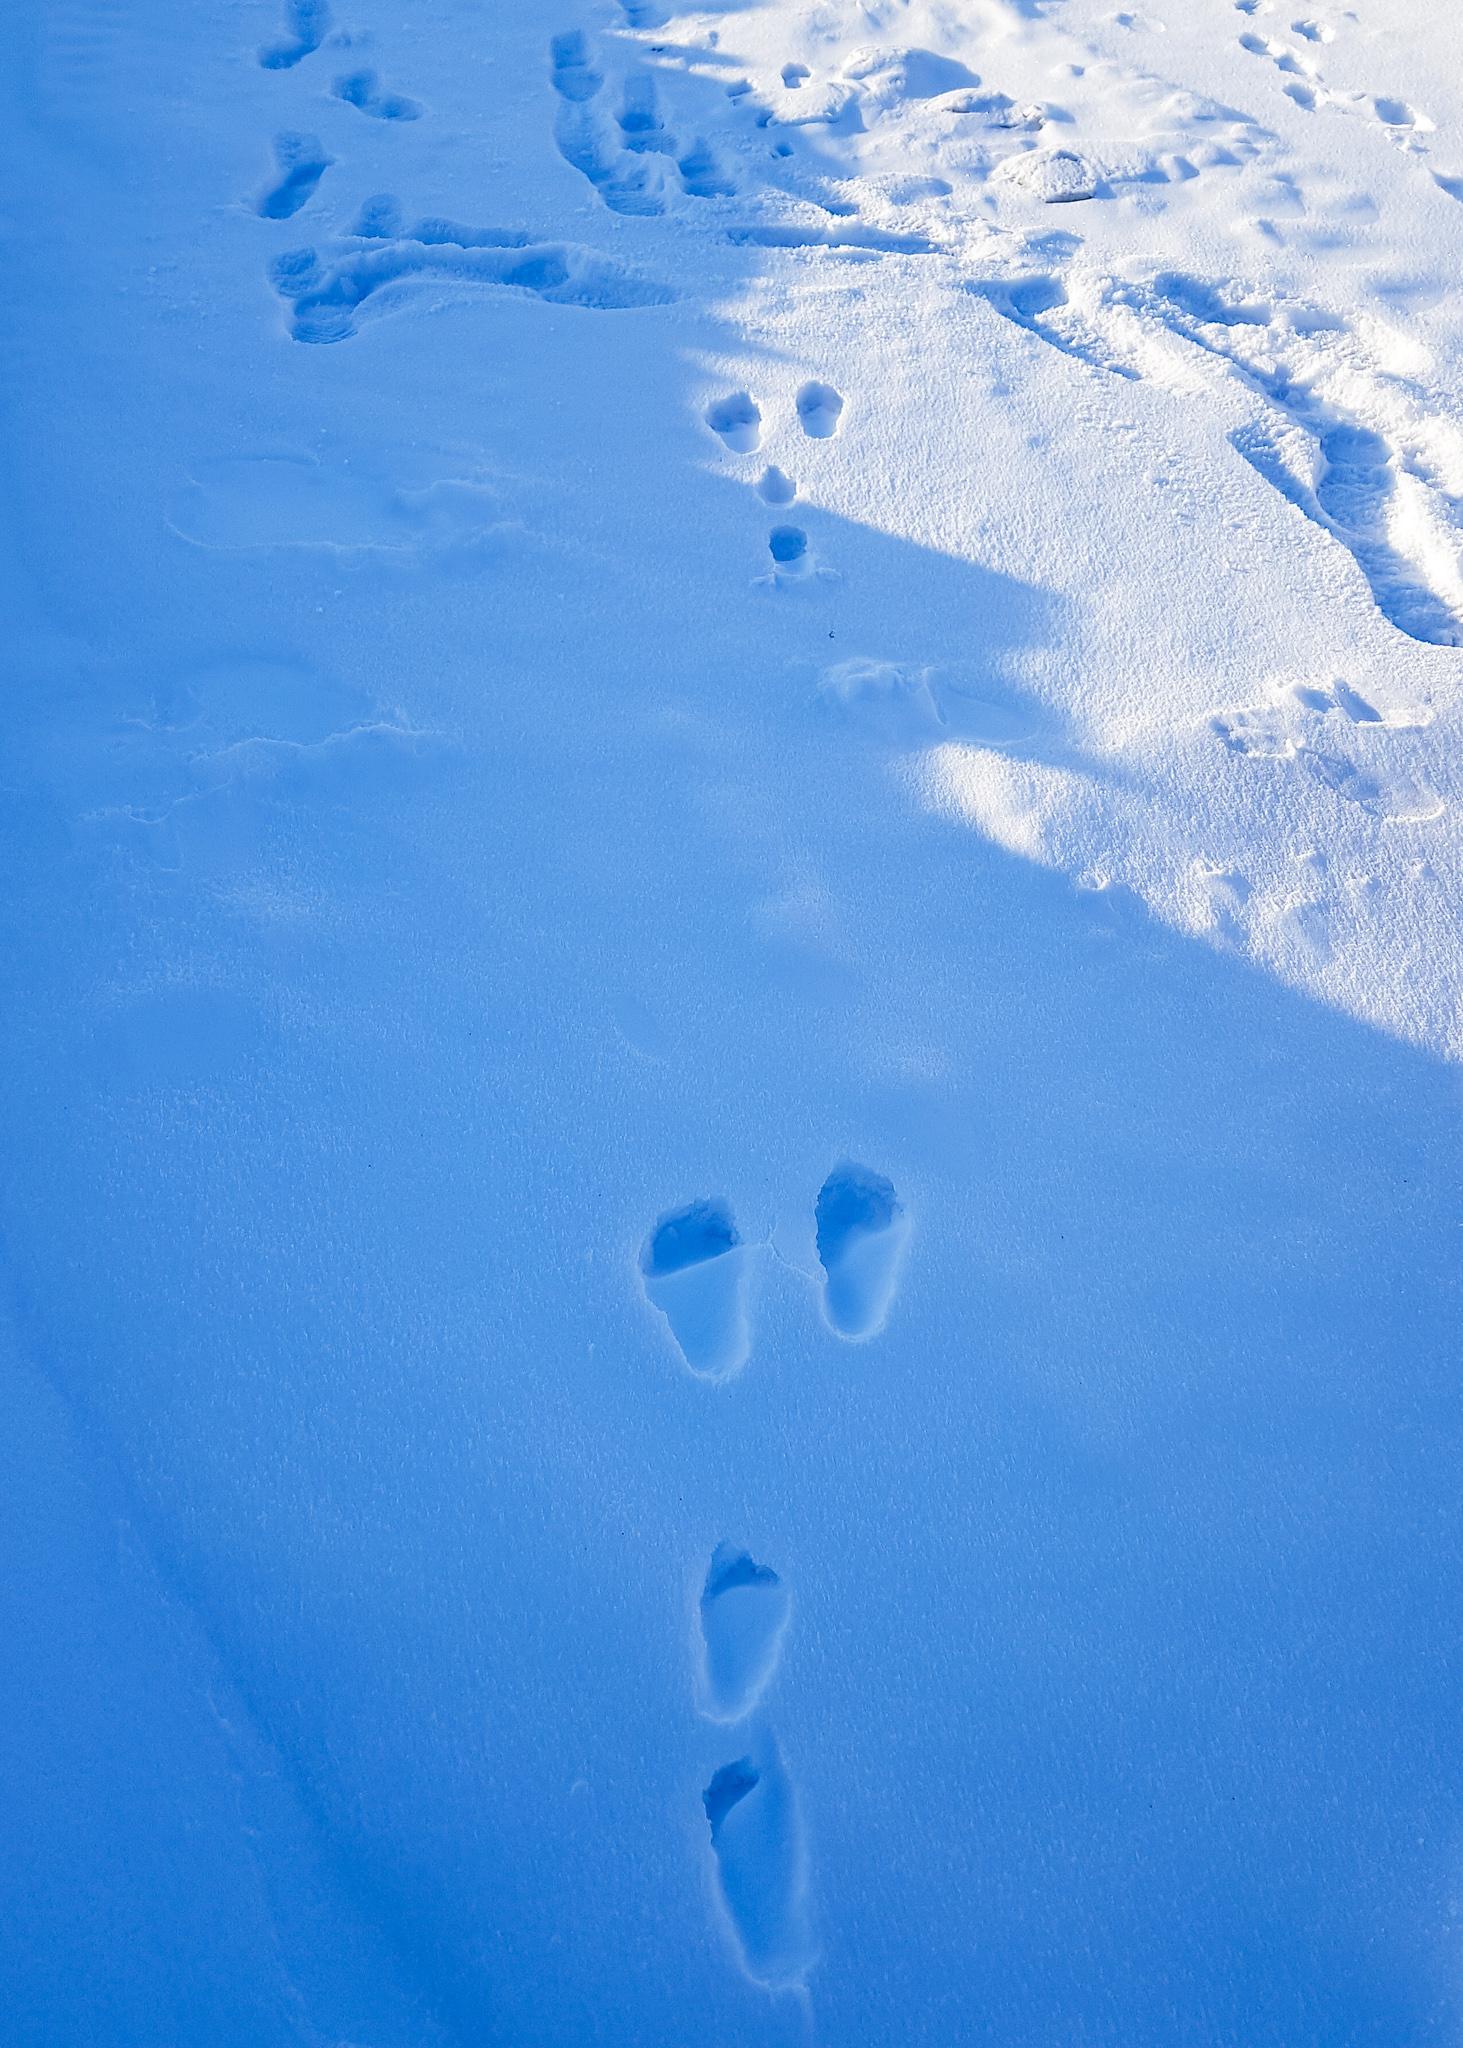 animal footprints in snow